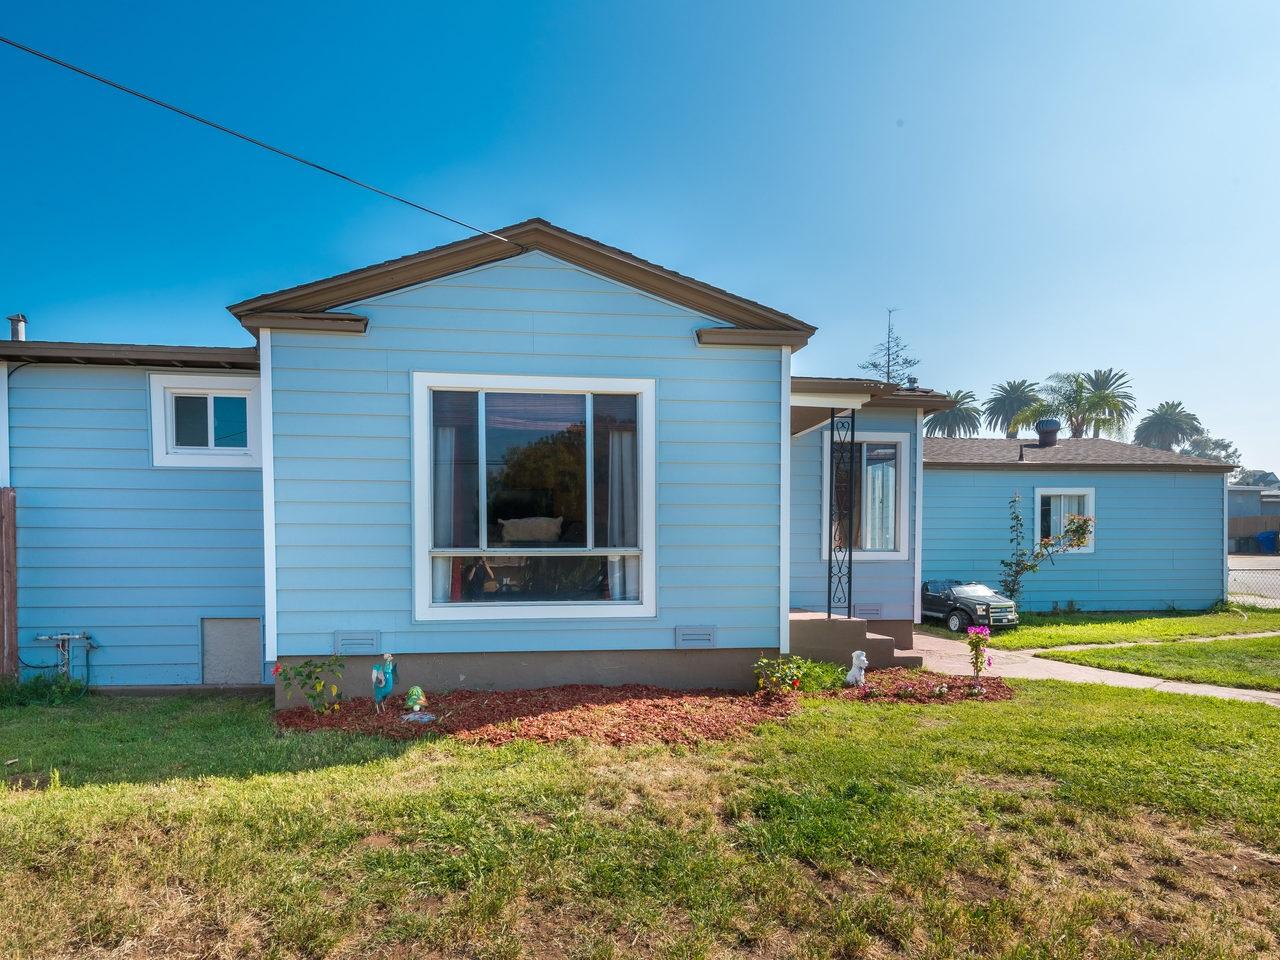 2145 N Avenue, National City, CA 91950